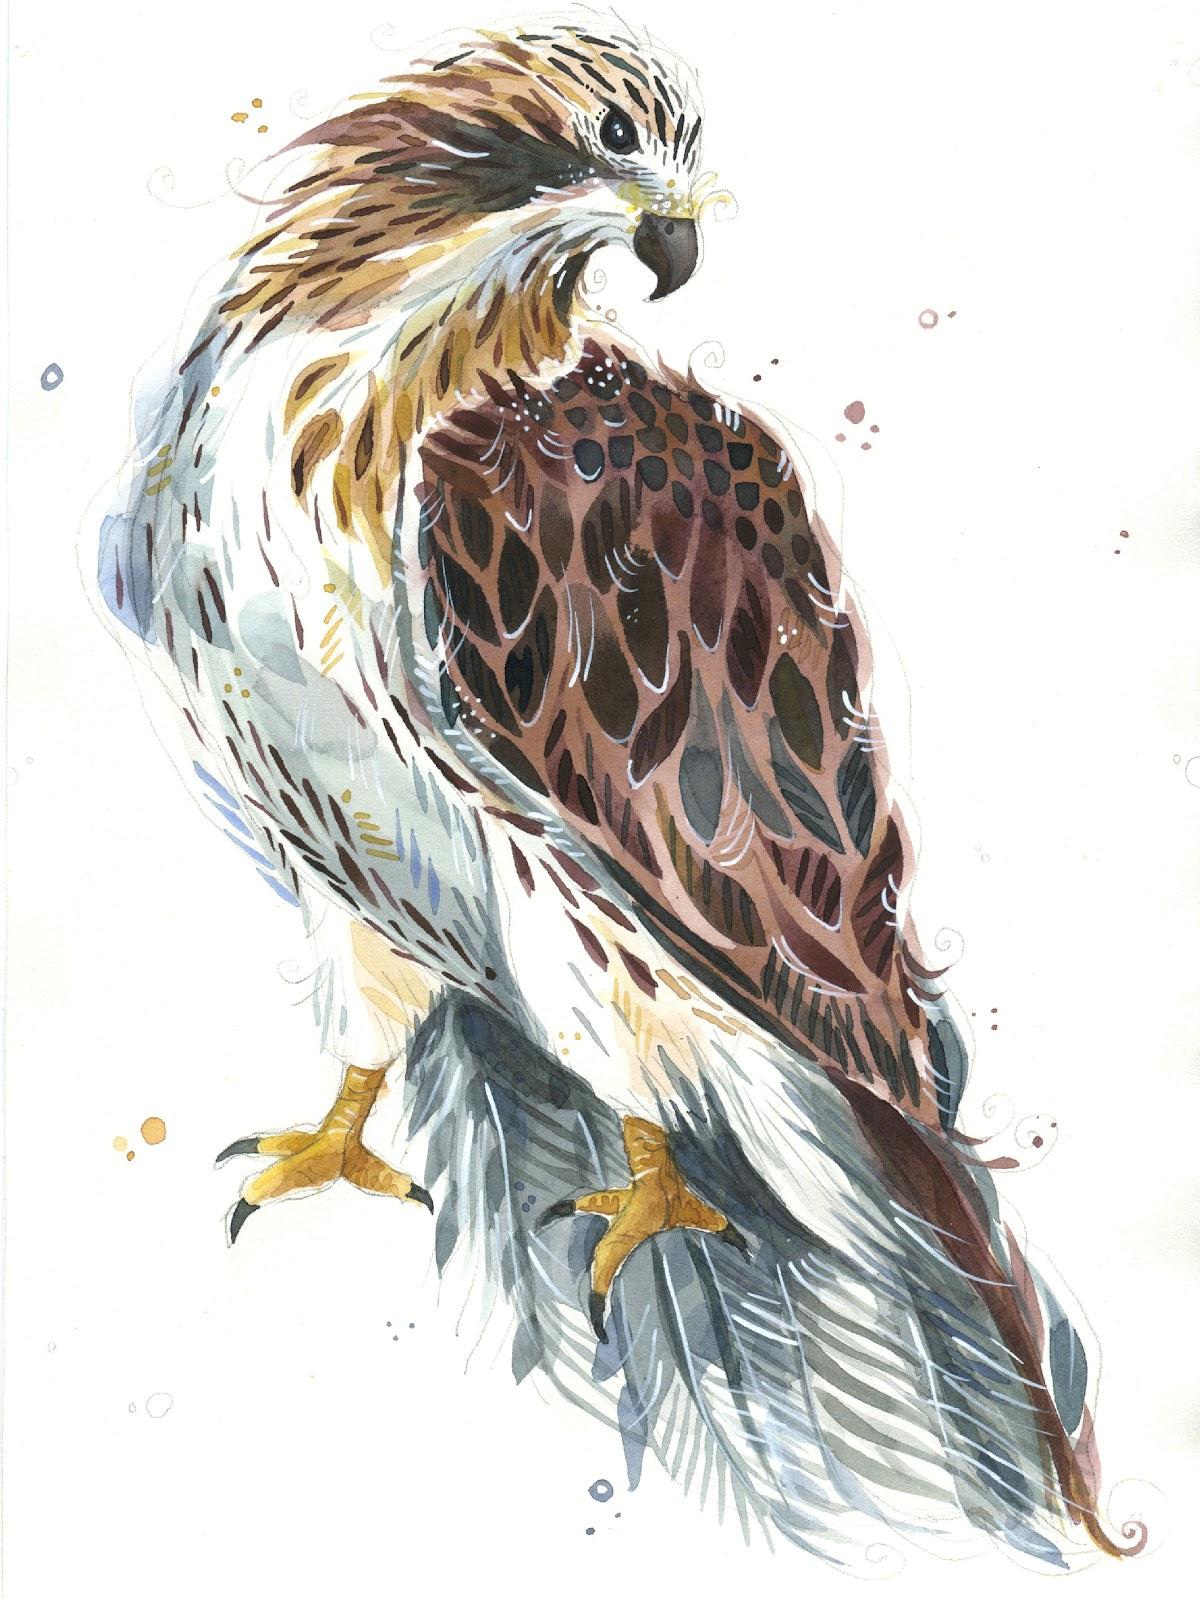 Hawk painting watercolor - photo#47